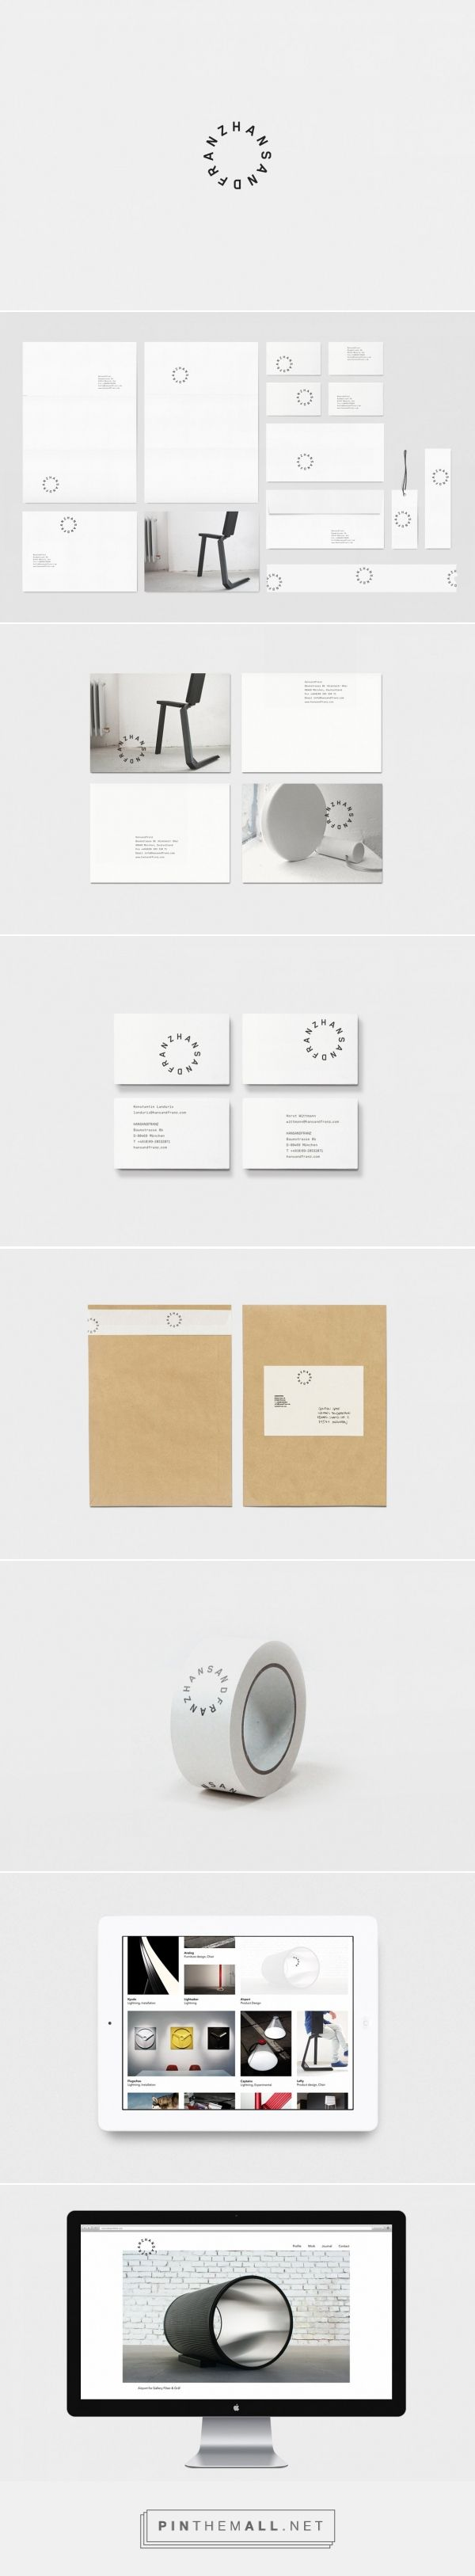 Hatch Inc. | Visual Journal - created via http://pinthemall.net